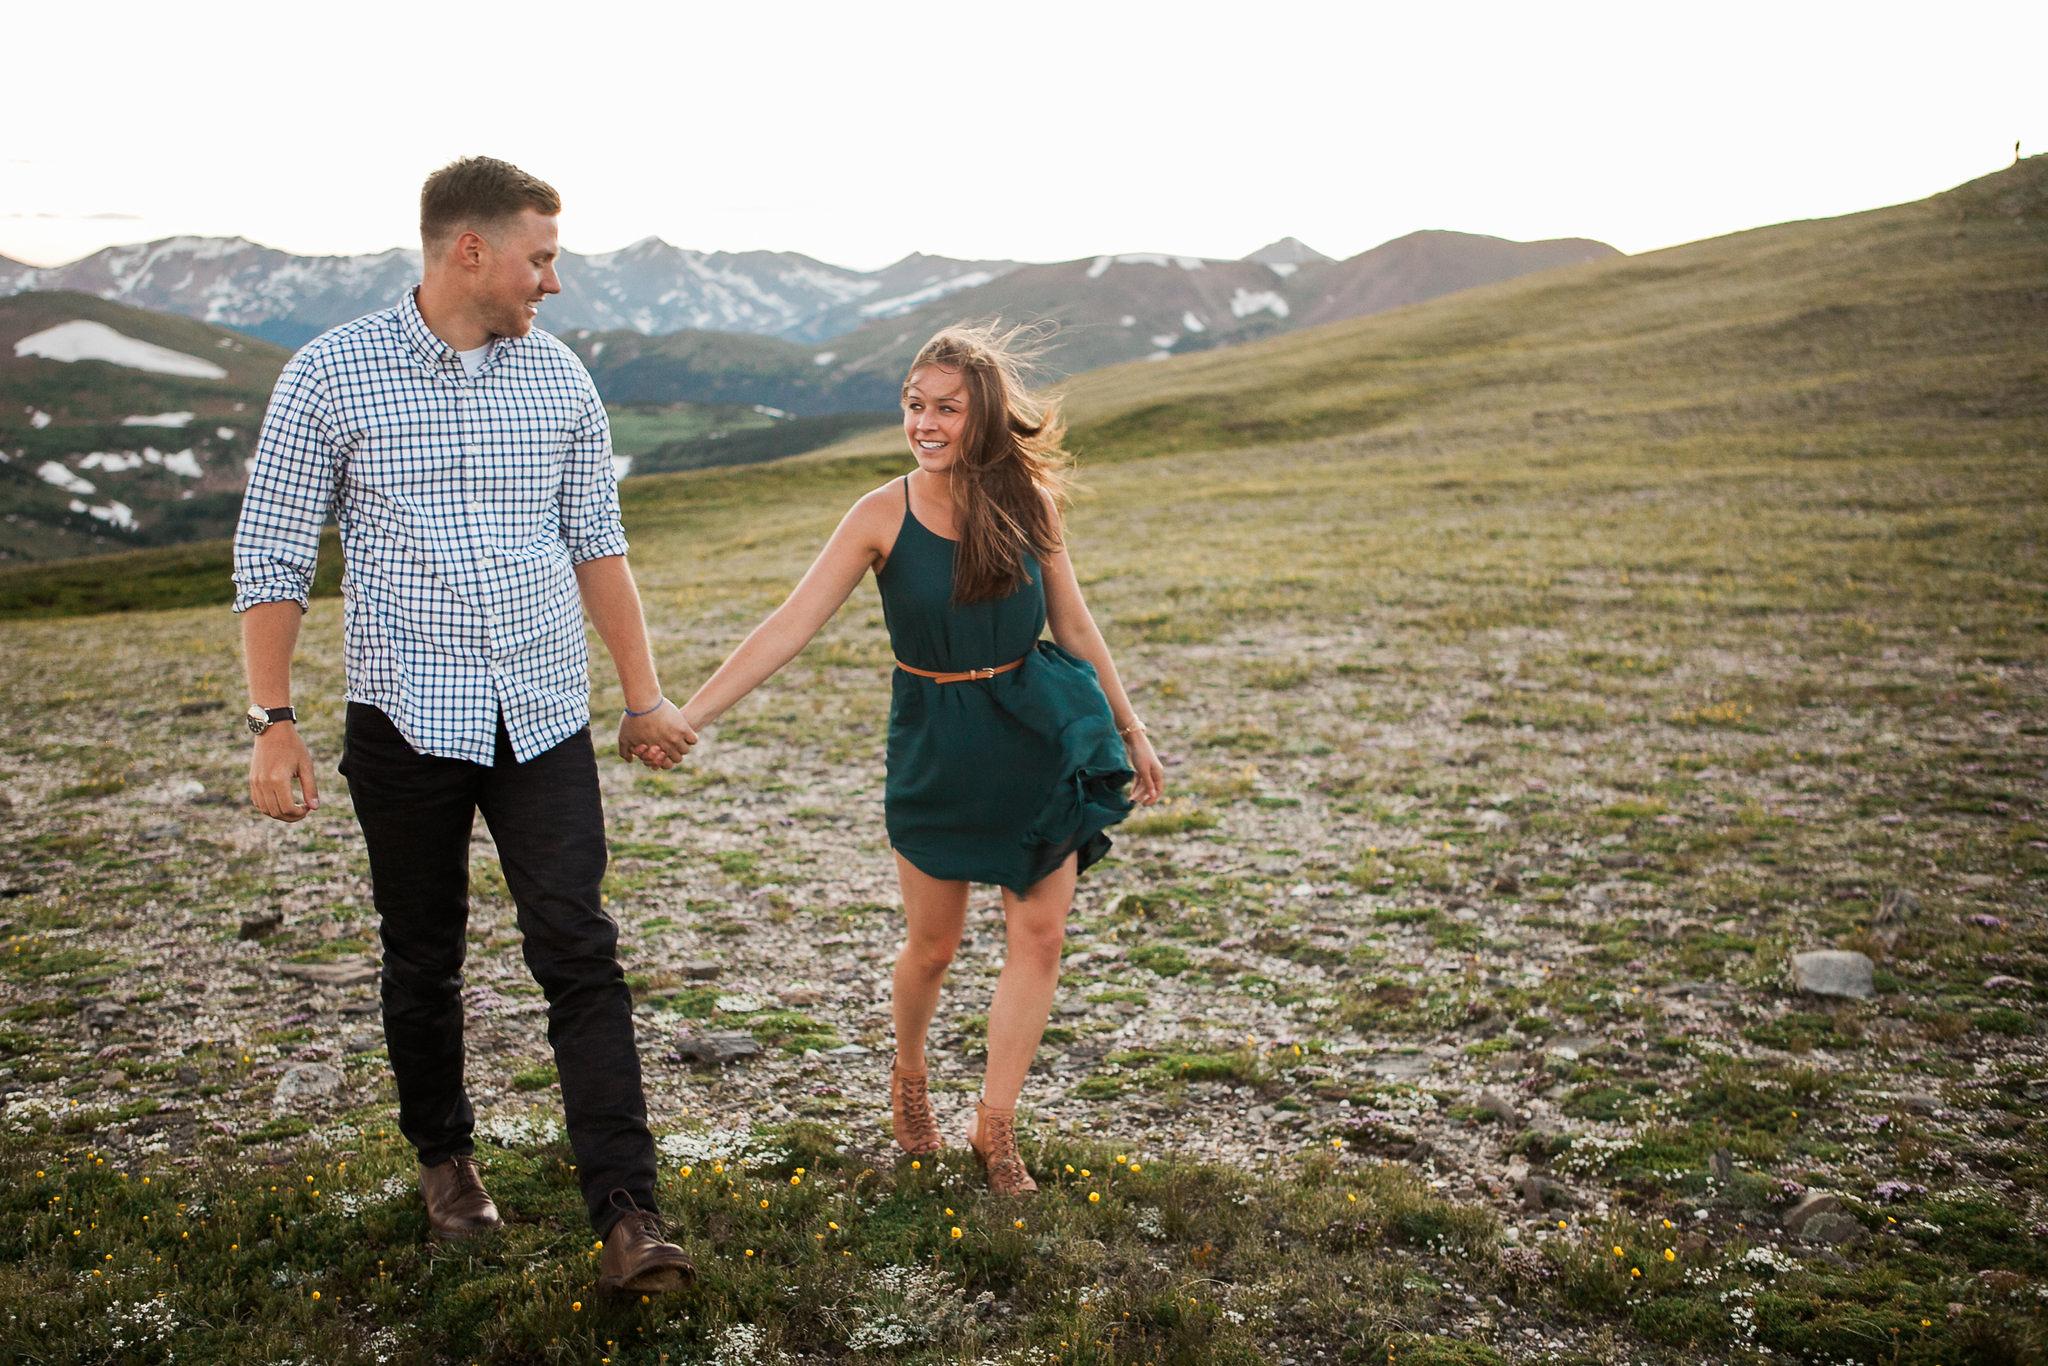 Rocky-Mountain-National-Park-engagement_054.jpg